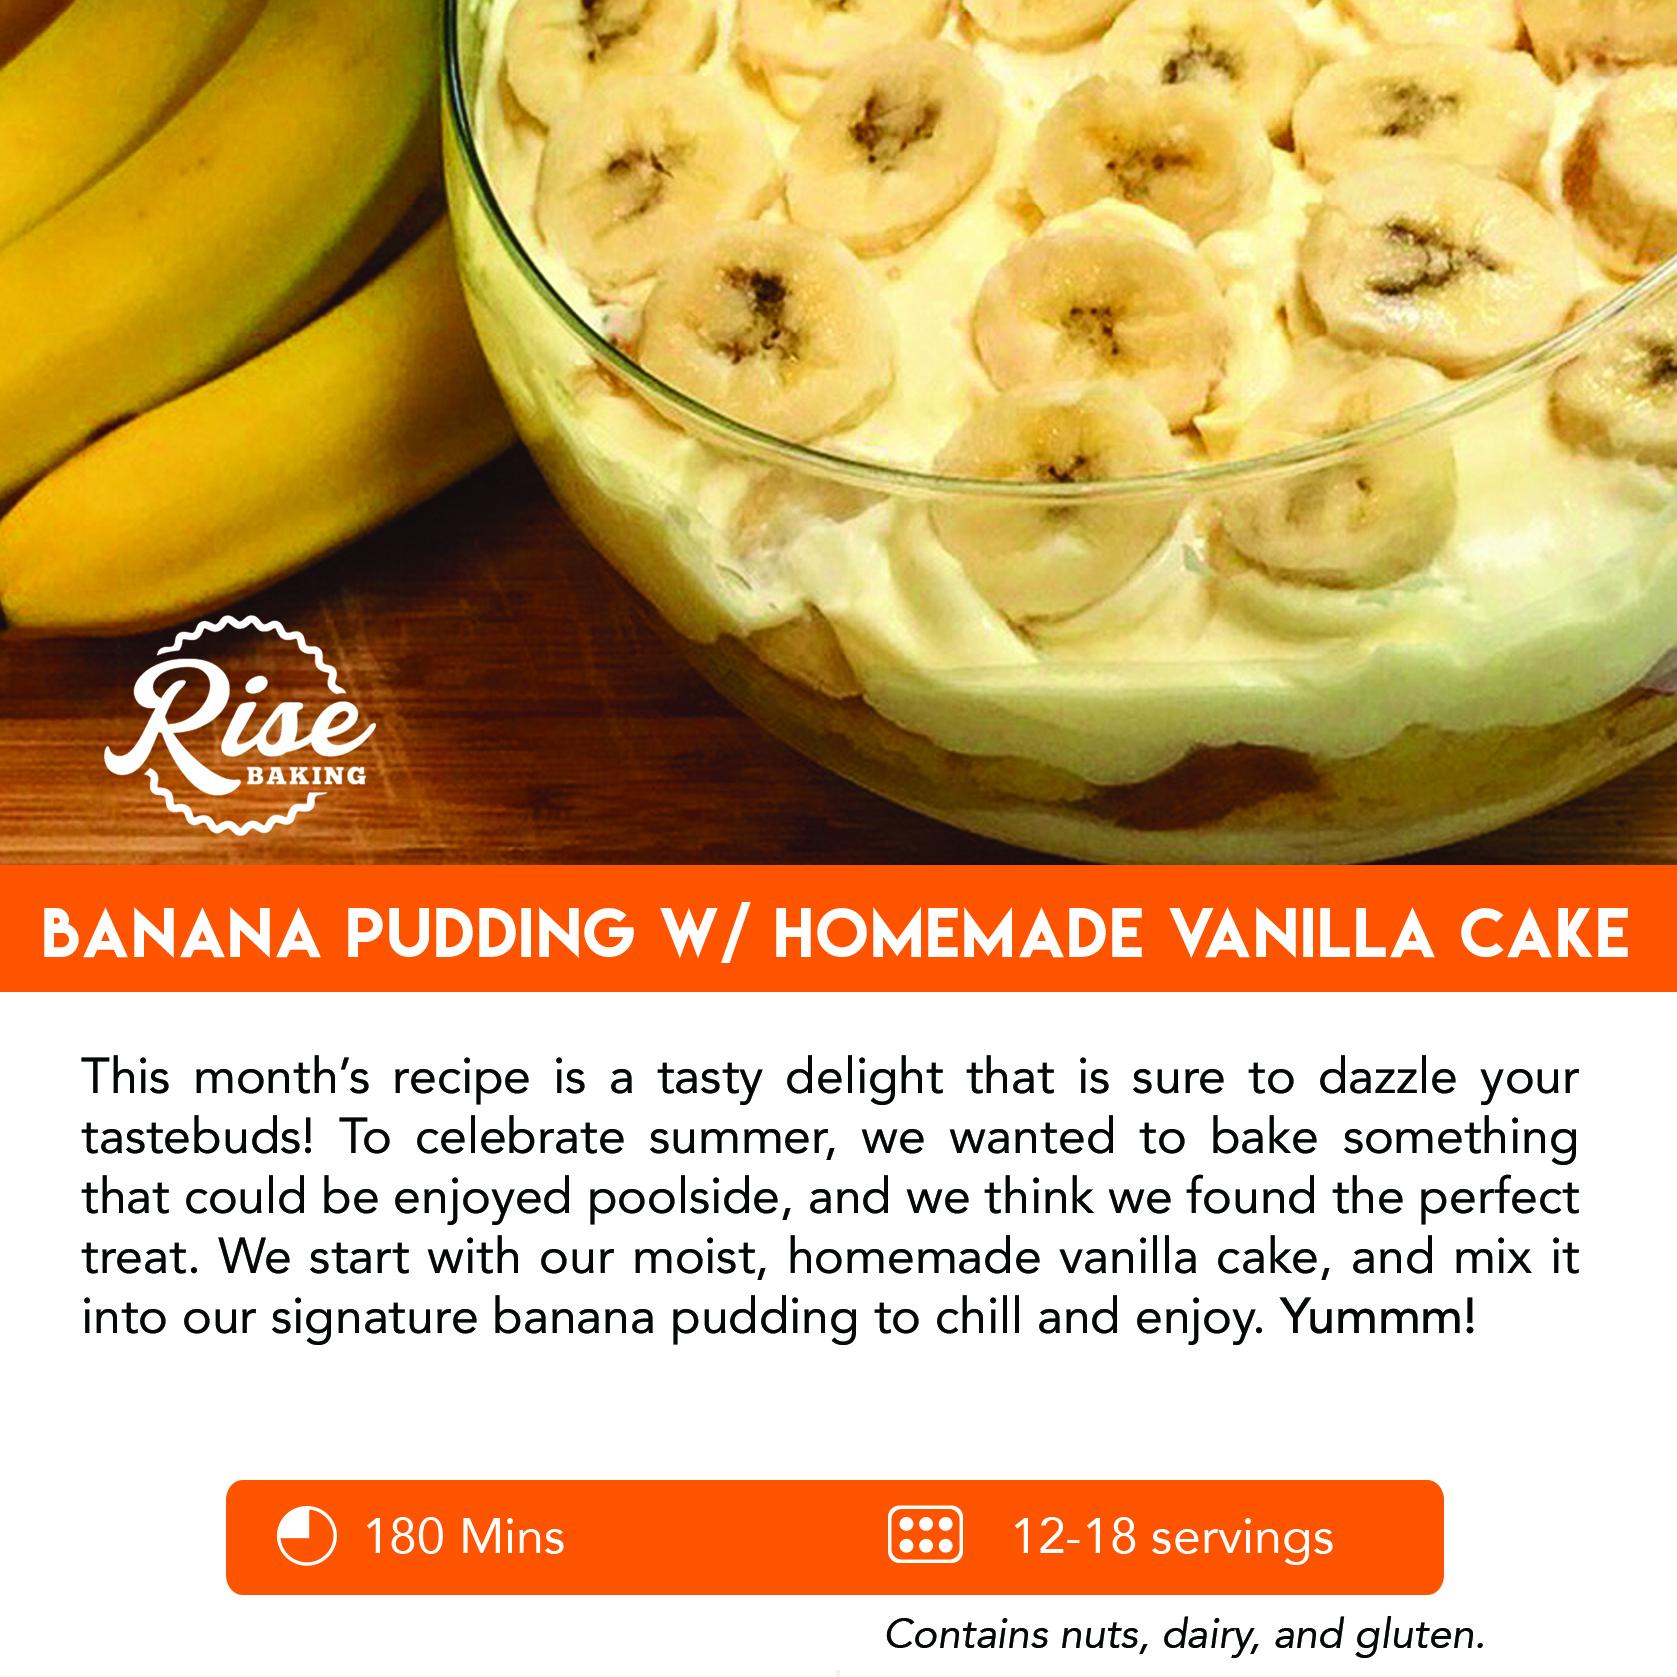 BananaPuddingSquare.jpg